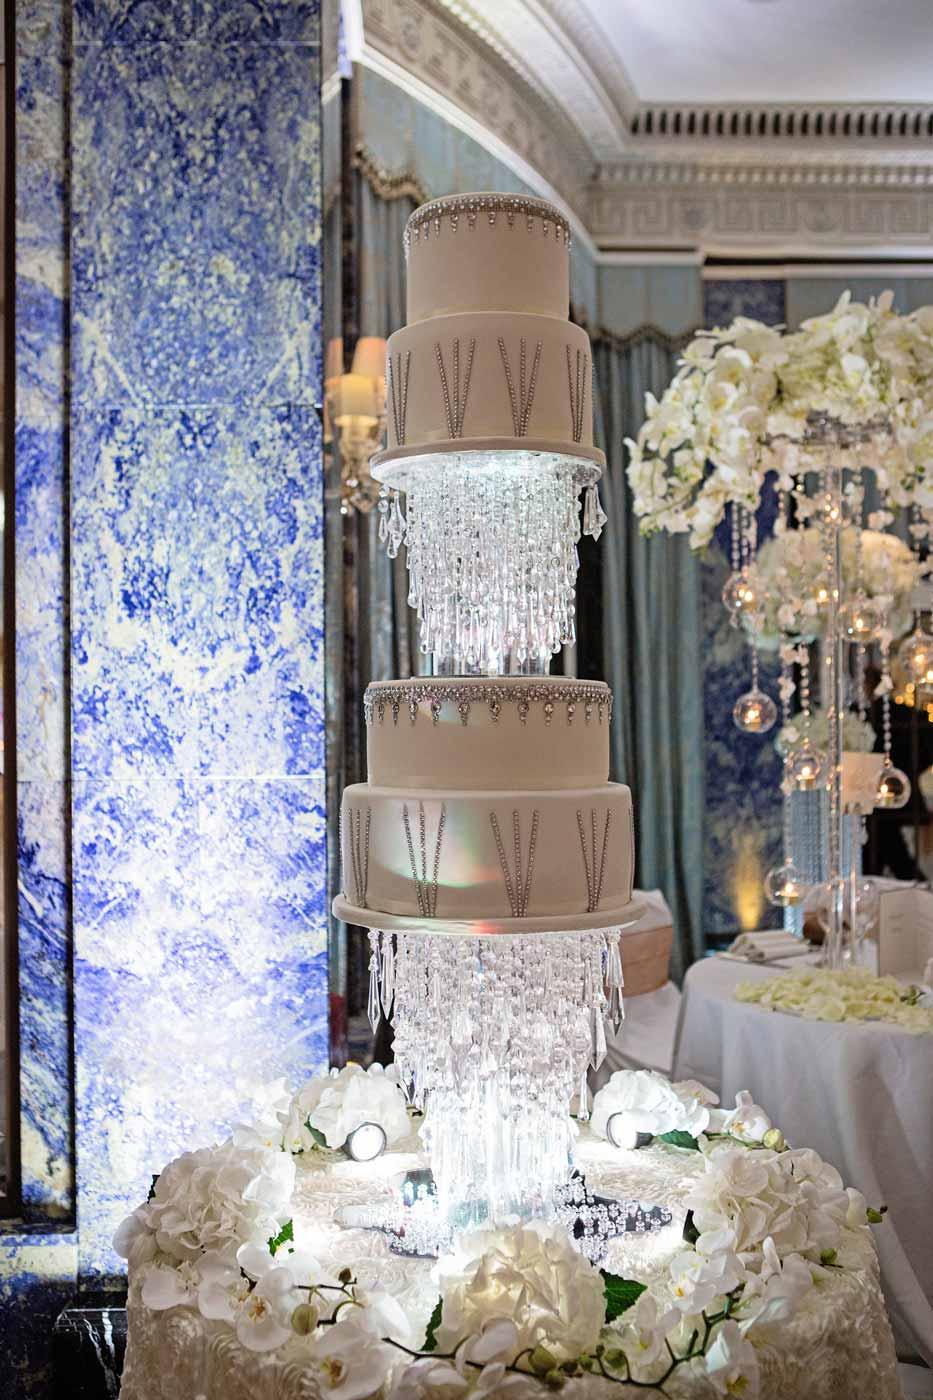 How To Make A Wedding Cake Canopy